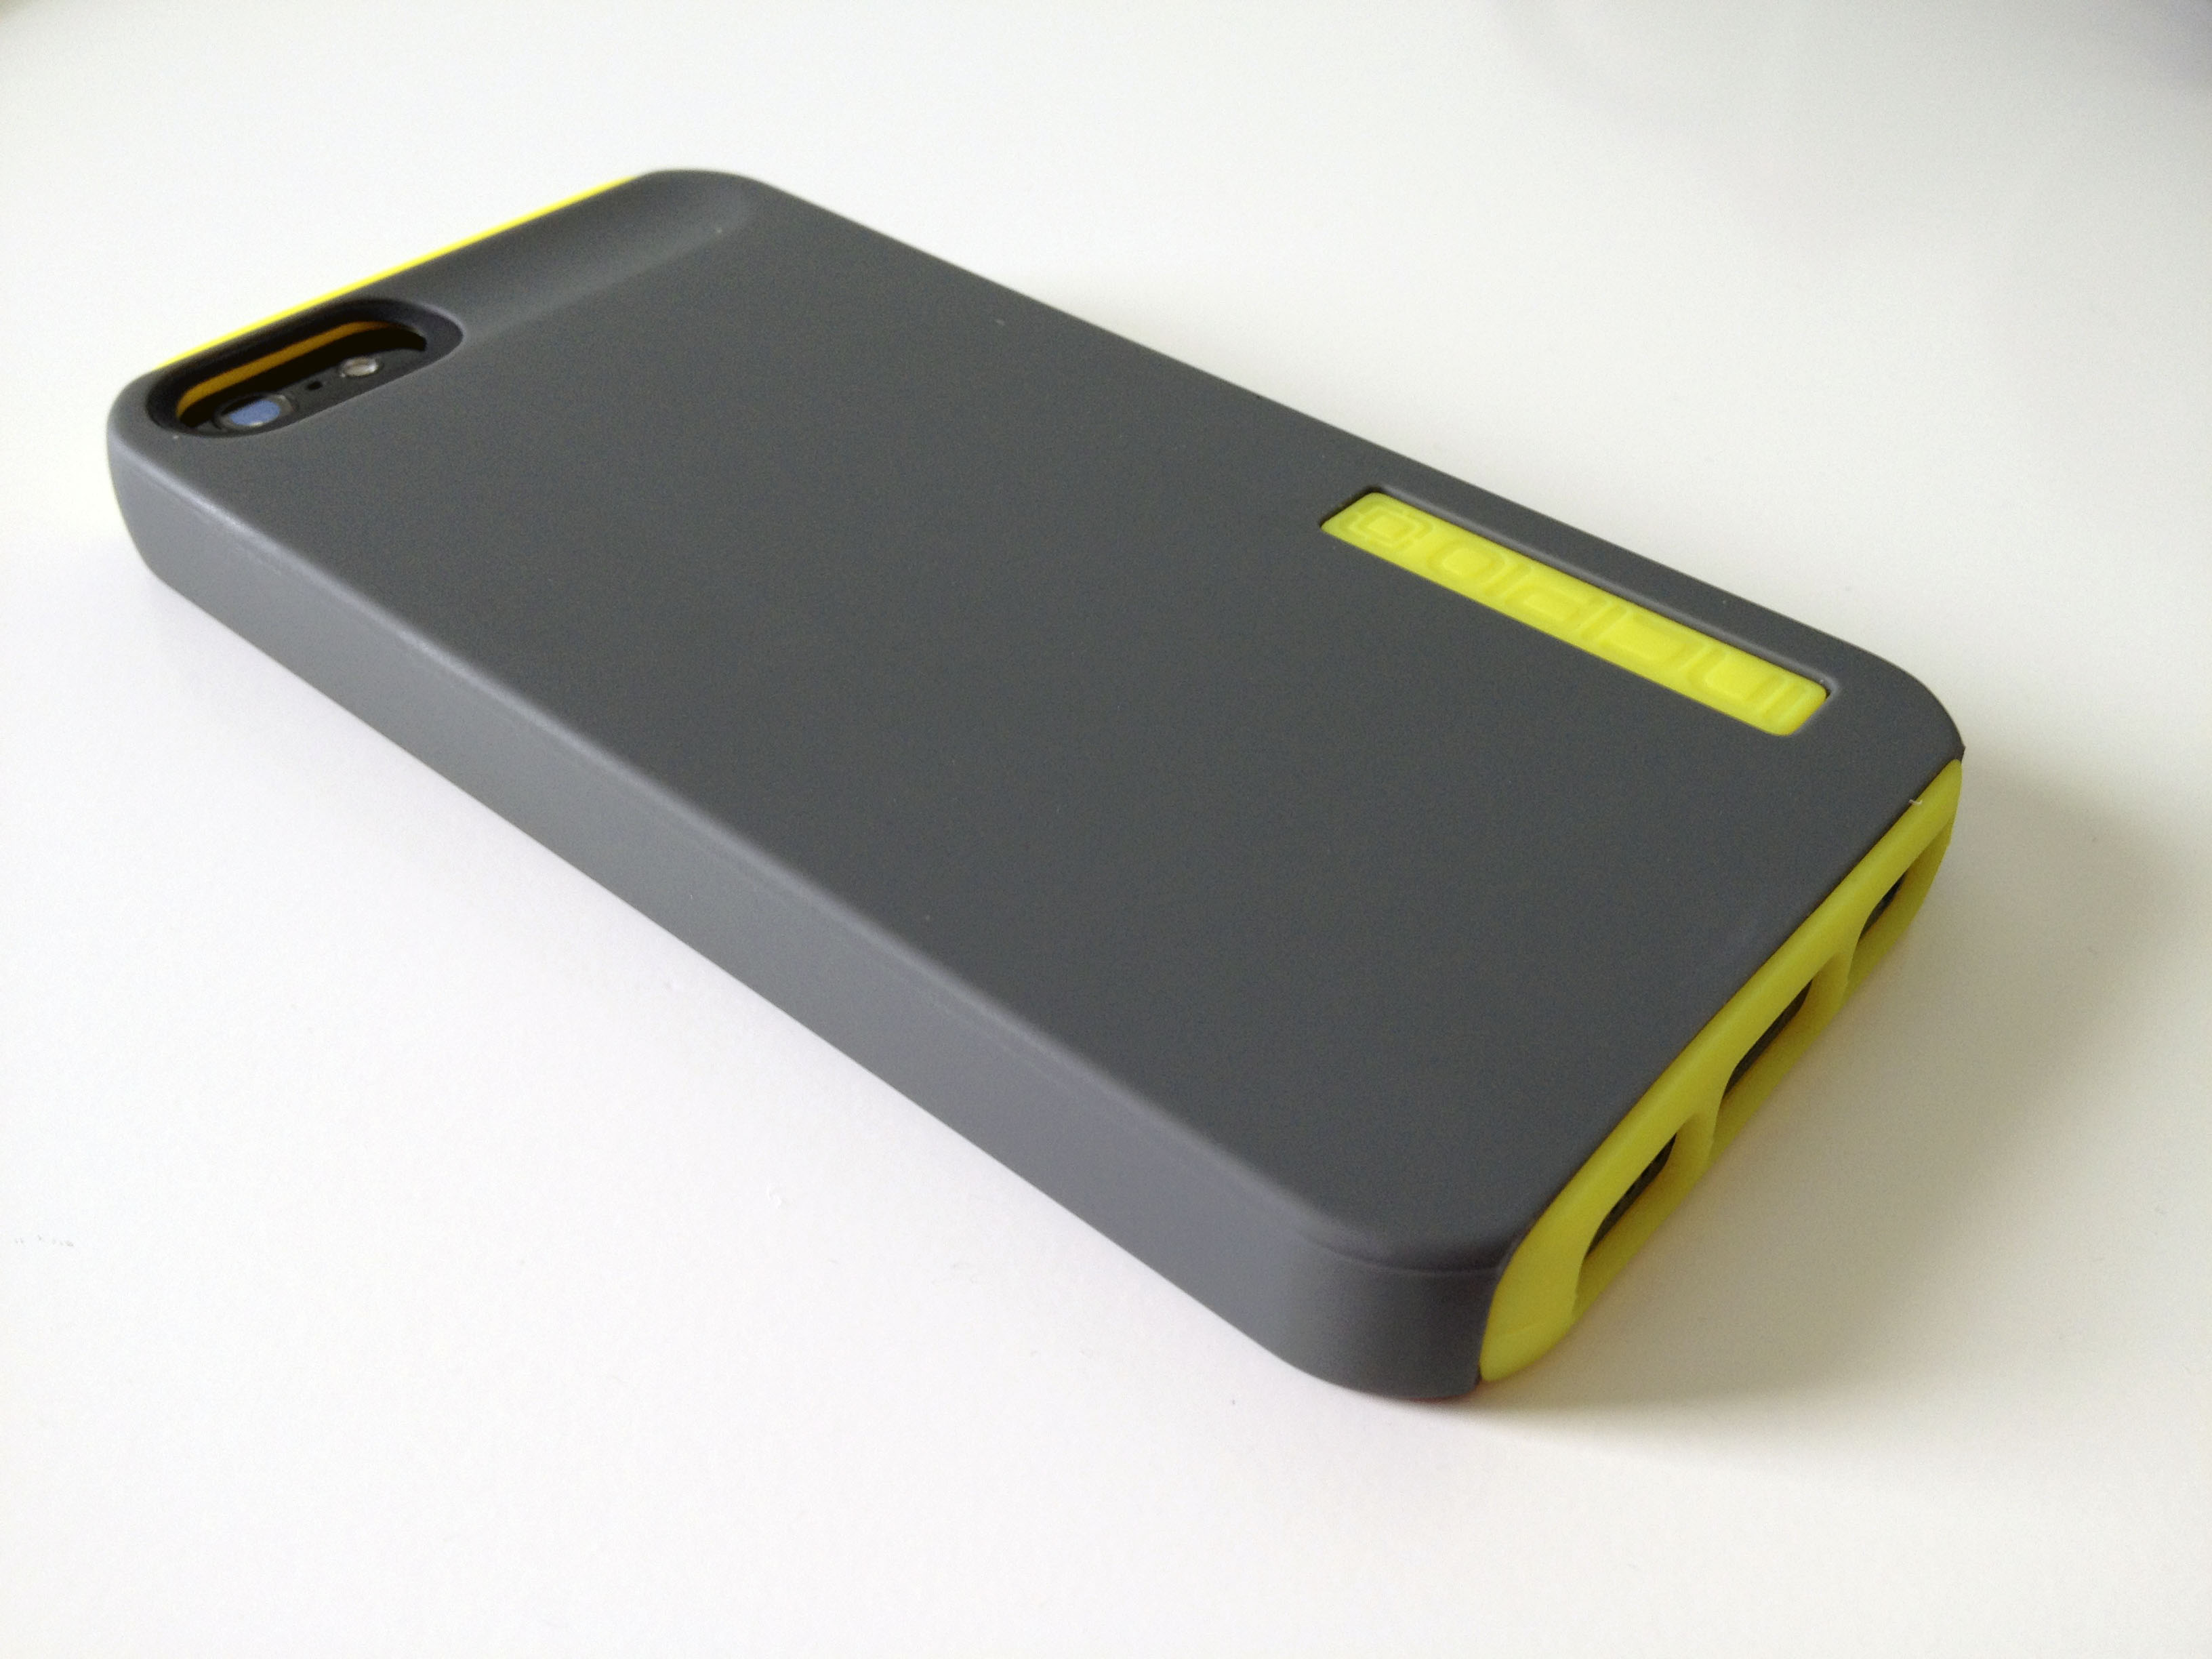 buy popular b37f4 83e10 Incipio DualPro iPhone 5 Case Review